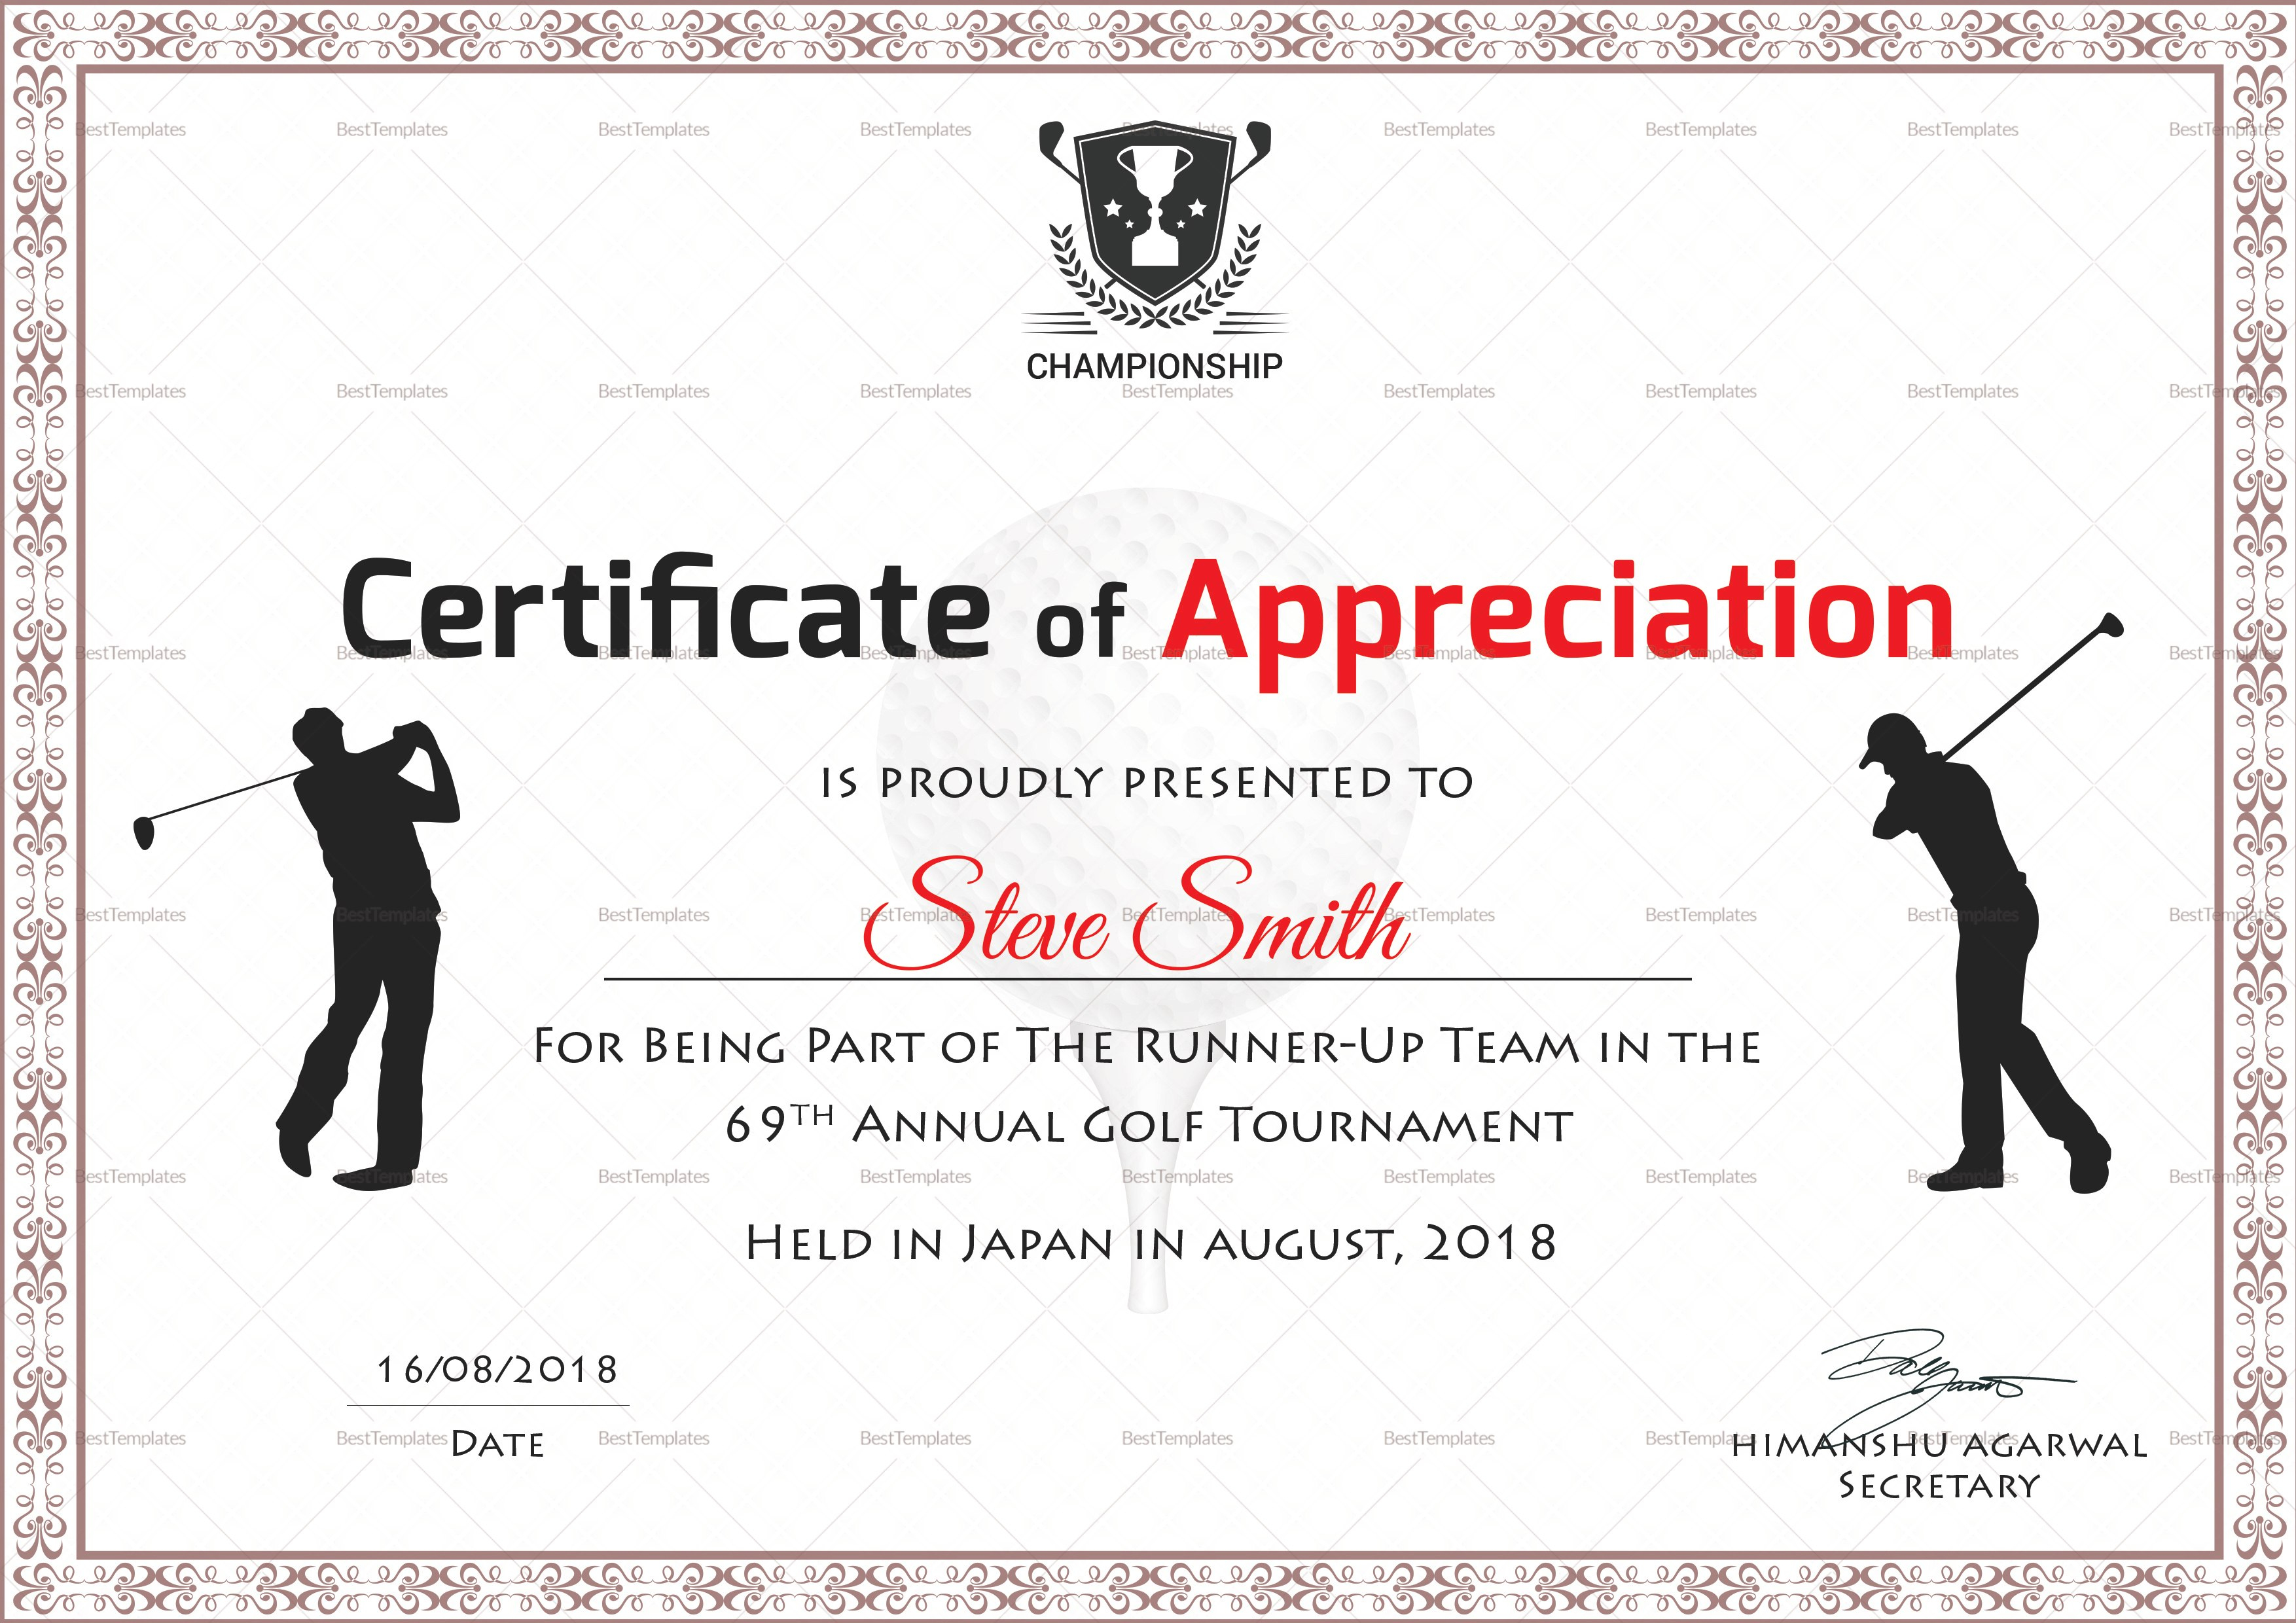 Golf Appreciation Certificate Design Template In Psd Word Regarding Golf Certificate Templates For Word